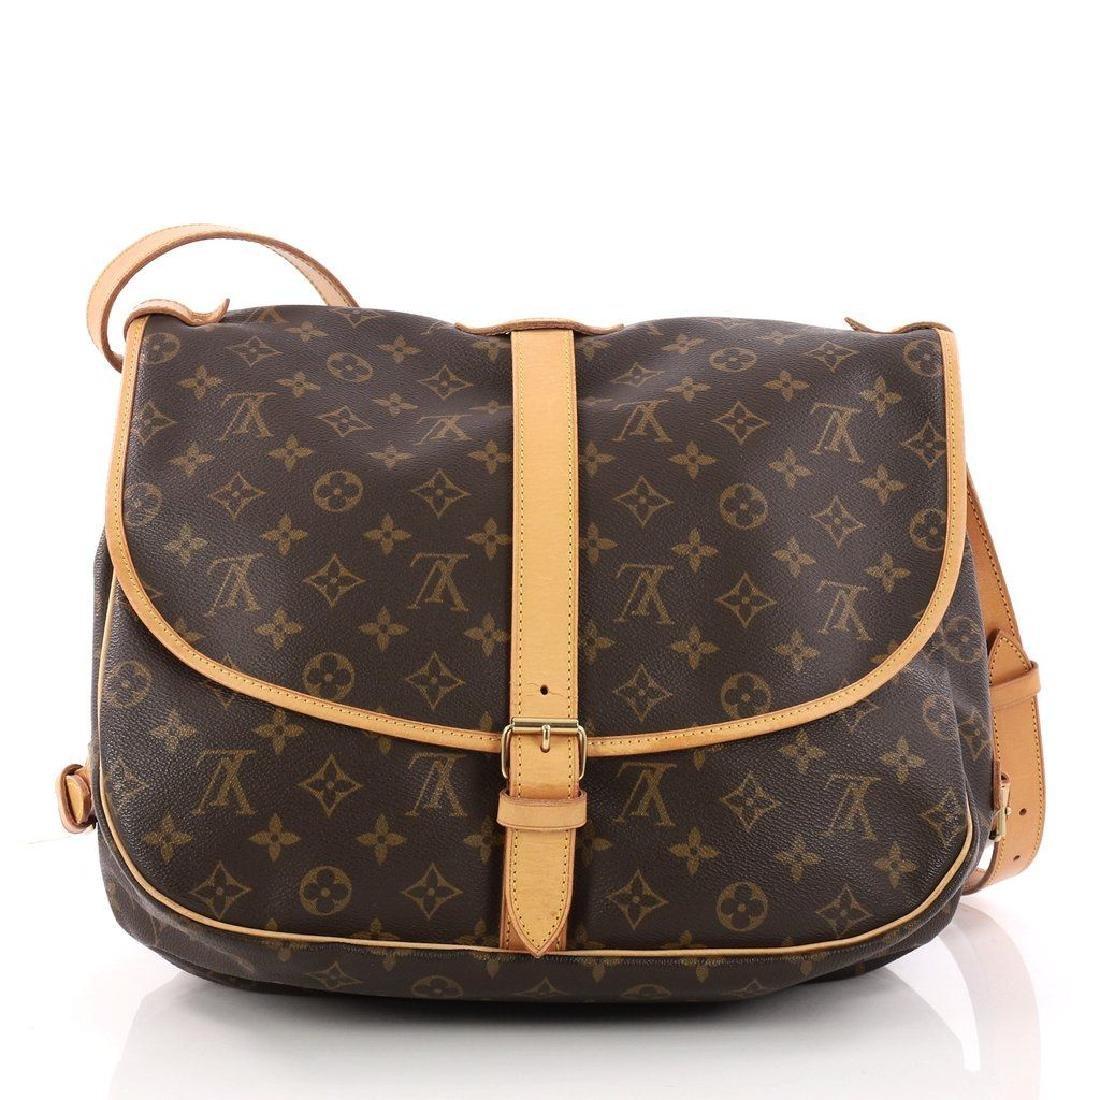 Louis Vuitton Monogram Saumur 35 GM Postal Shoulder Bag - 2